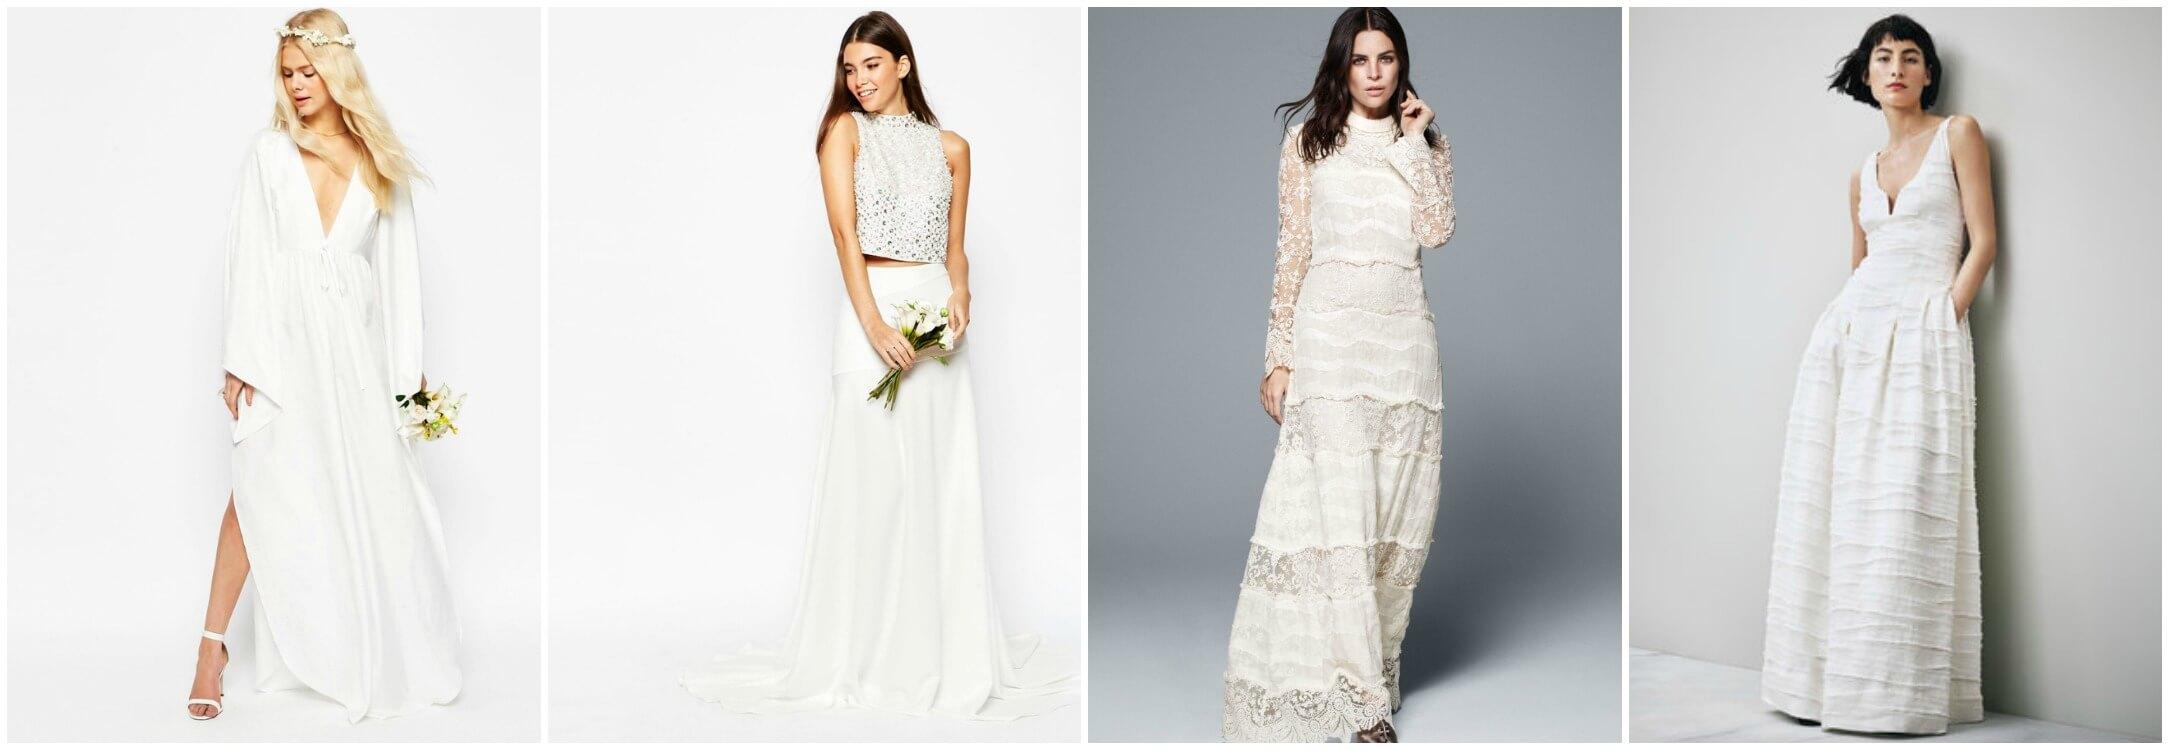 ASOSHM-WeddingTrends-NTL